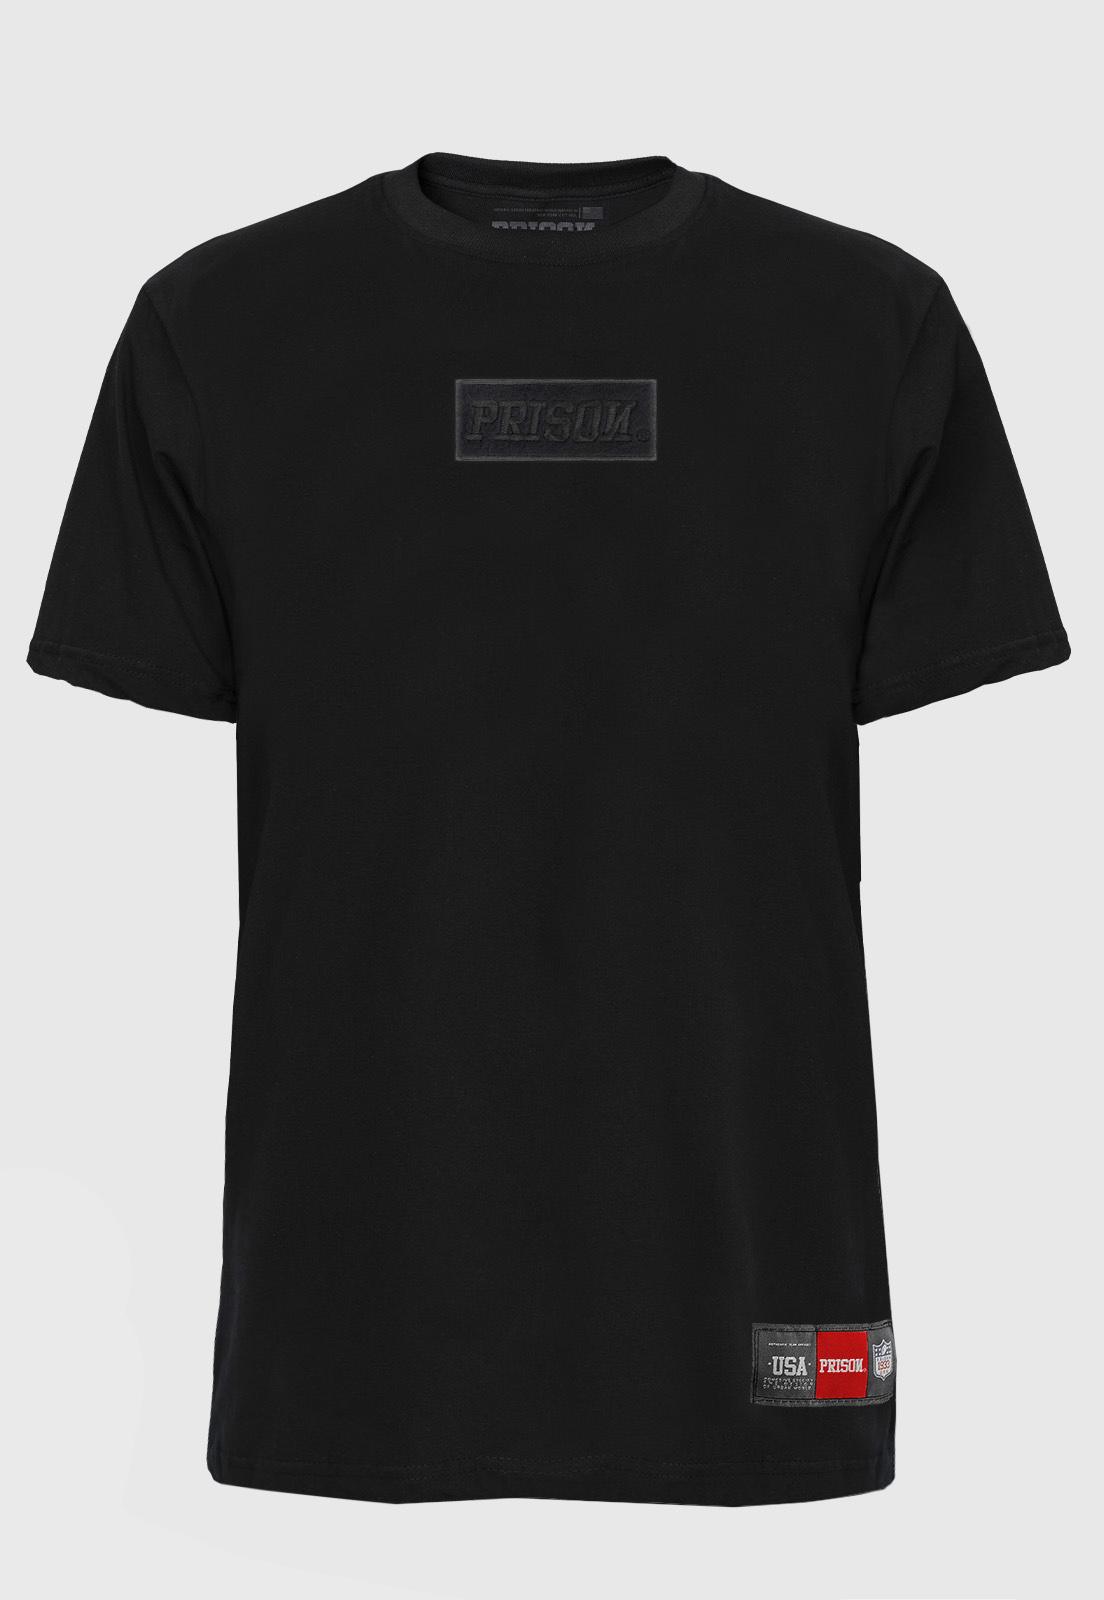 Camiseta Streetwear Prison Classic Black